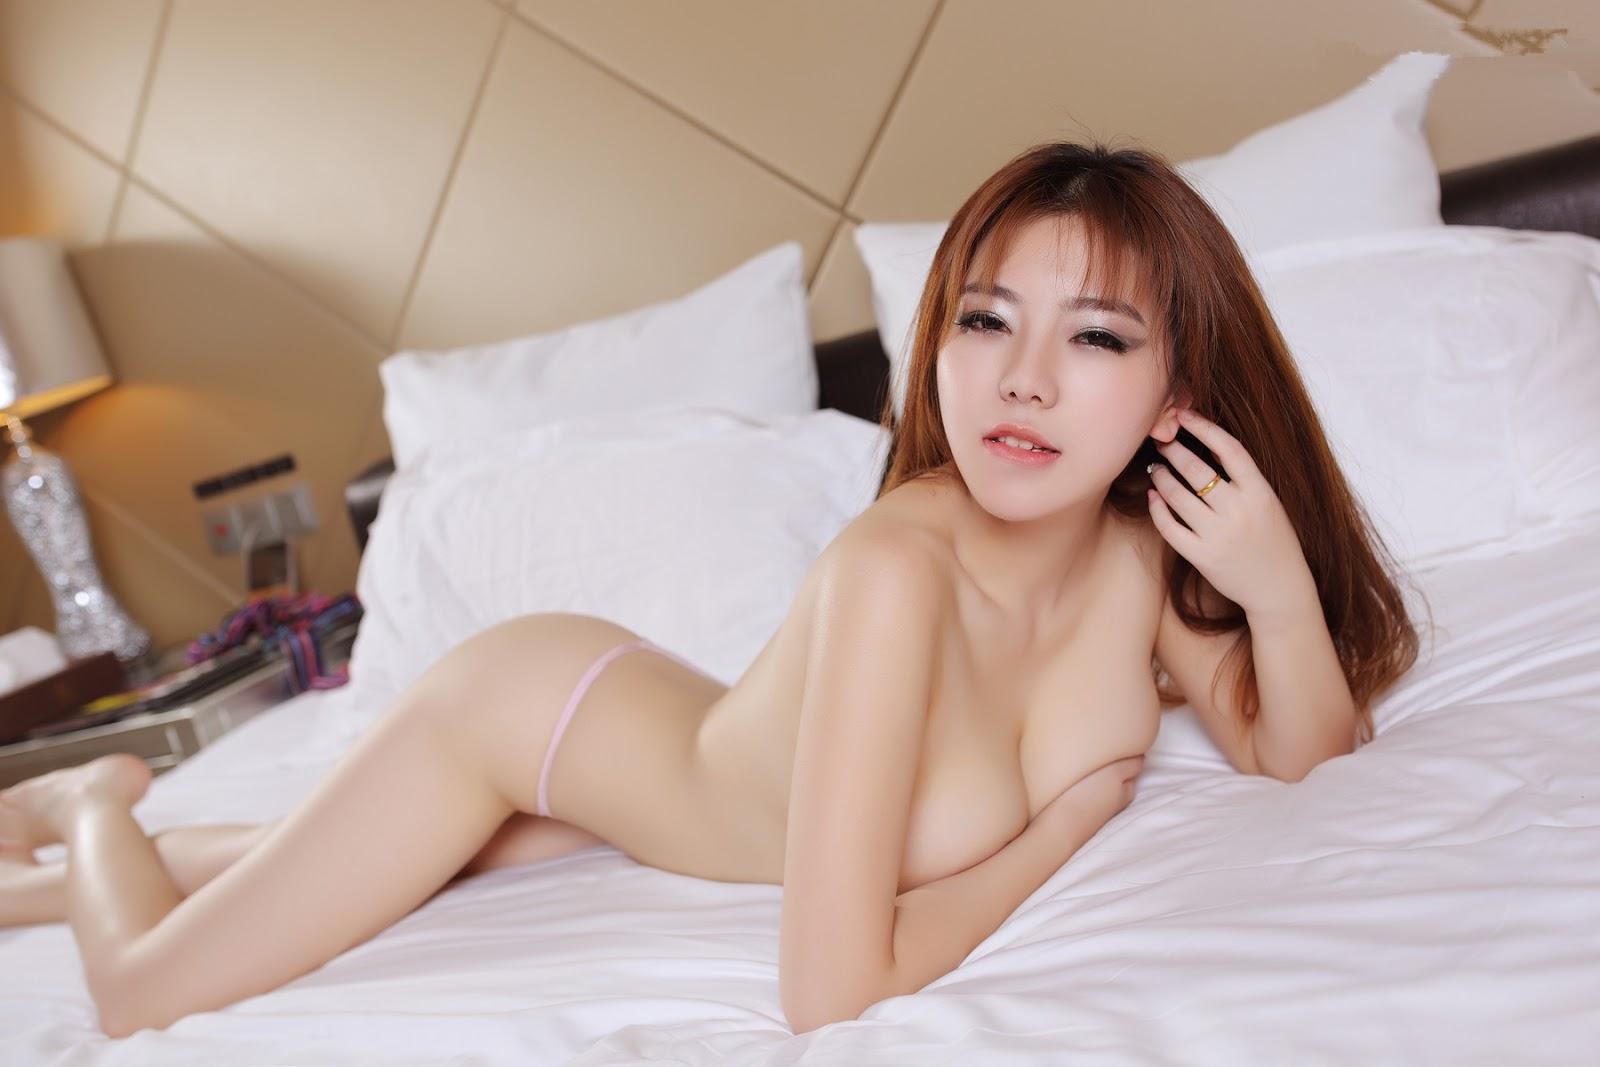 %2529%252B%252B%25C2%25A6%25C2%25B7 62 - TGOD Sexy Nude FAYE